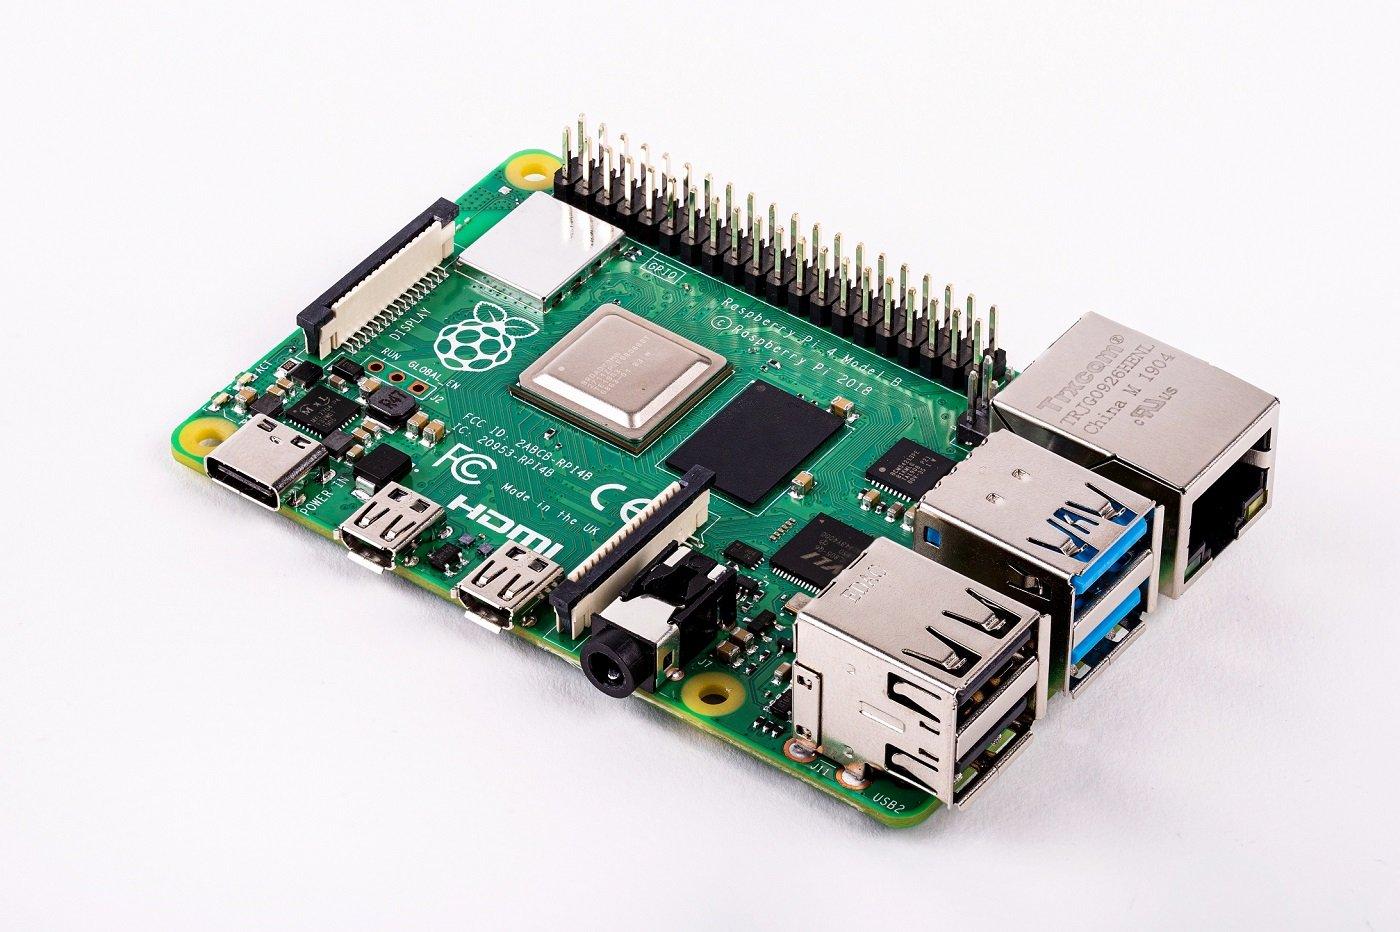 Le Raspberry Pi 4 Model B